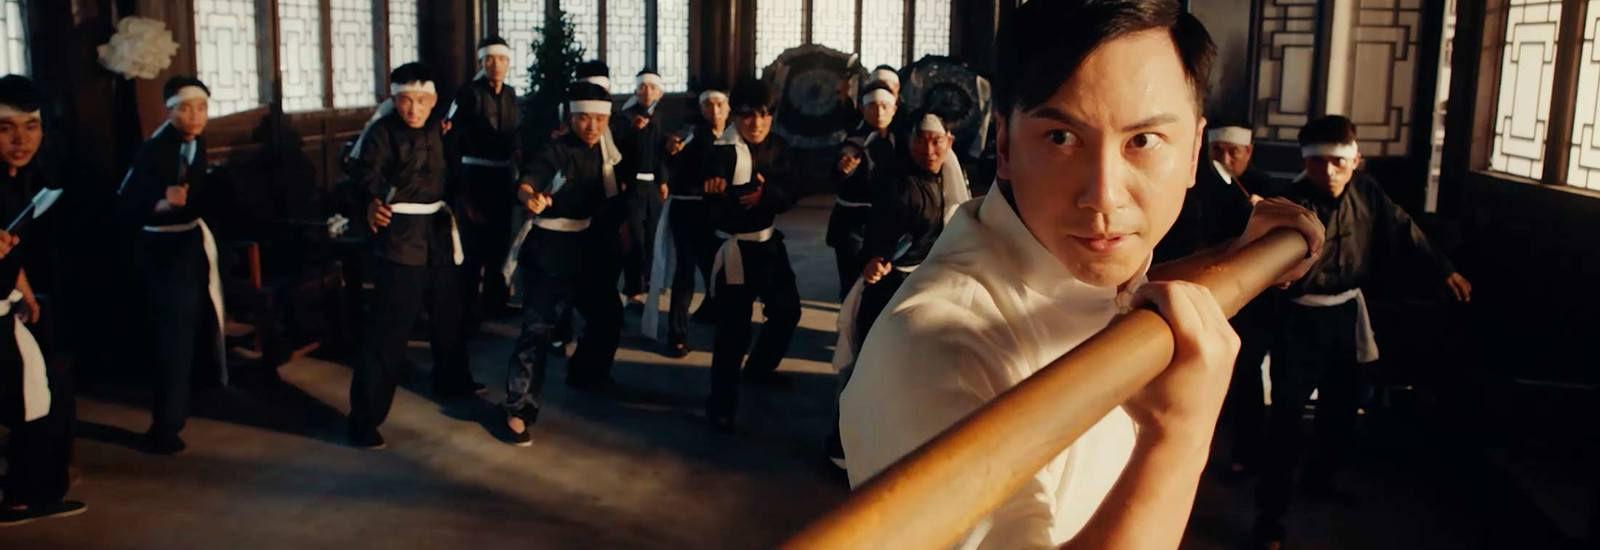 Ip Man : Kung Fu Master (BANDE-ANNONCE) avec Yu-Hang To, Michael Wong, Wanliruo Xin